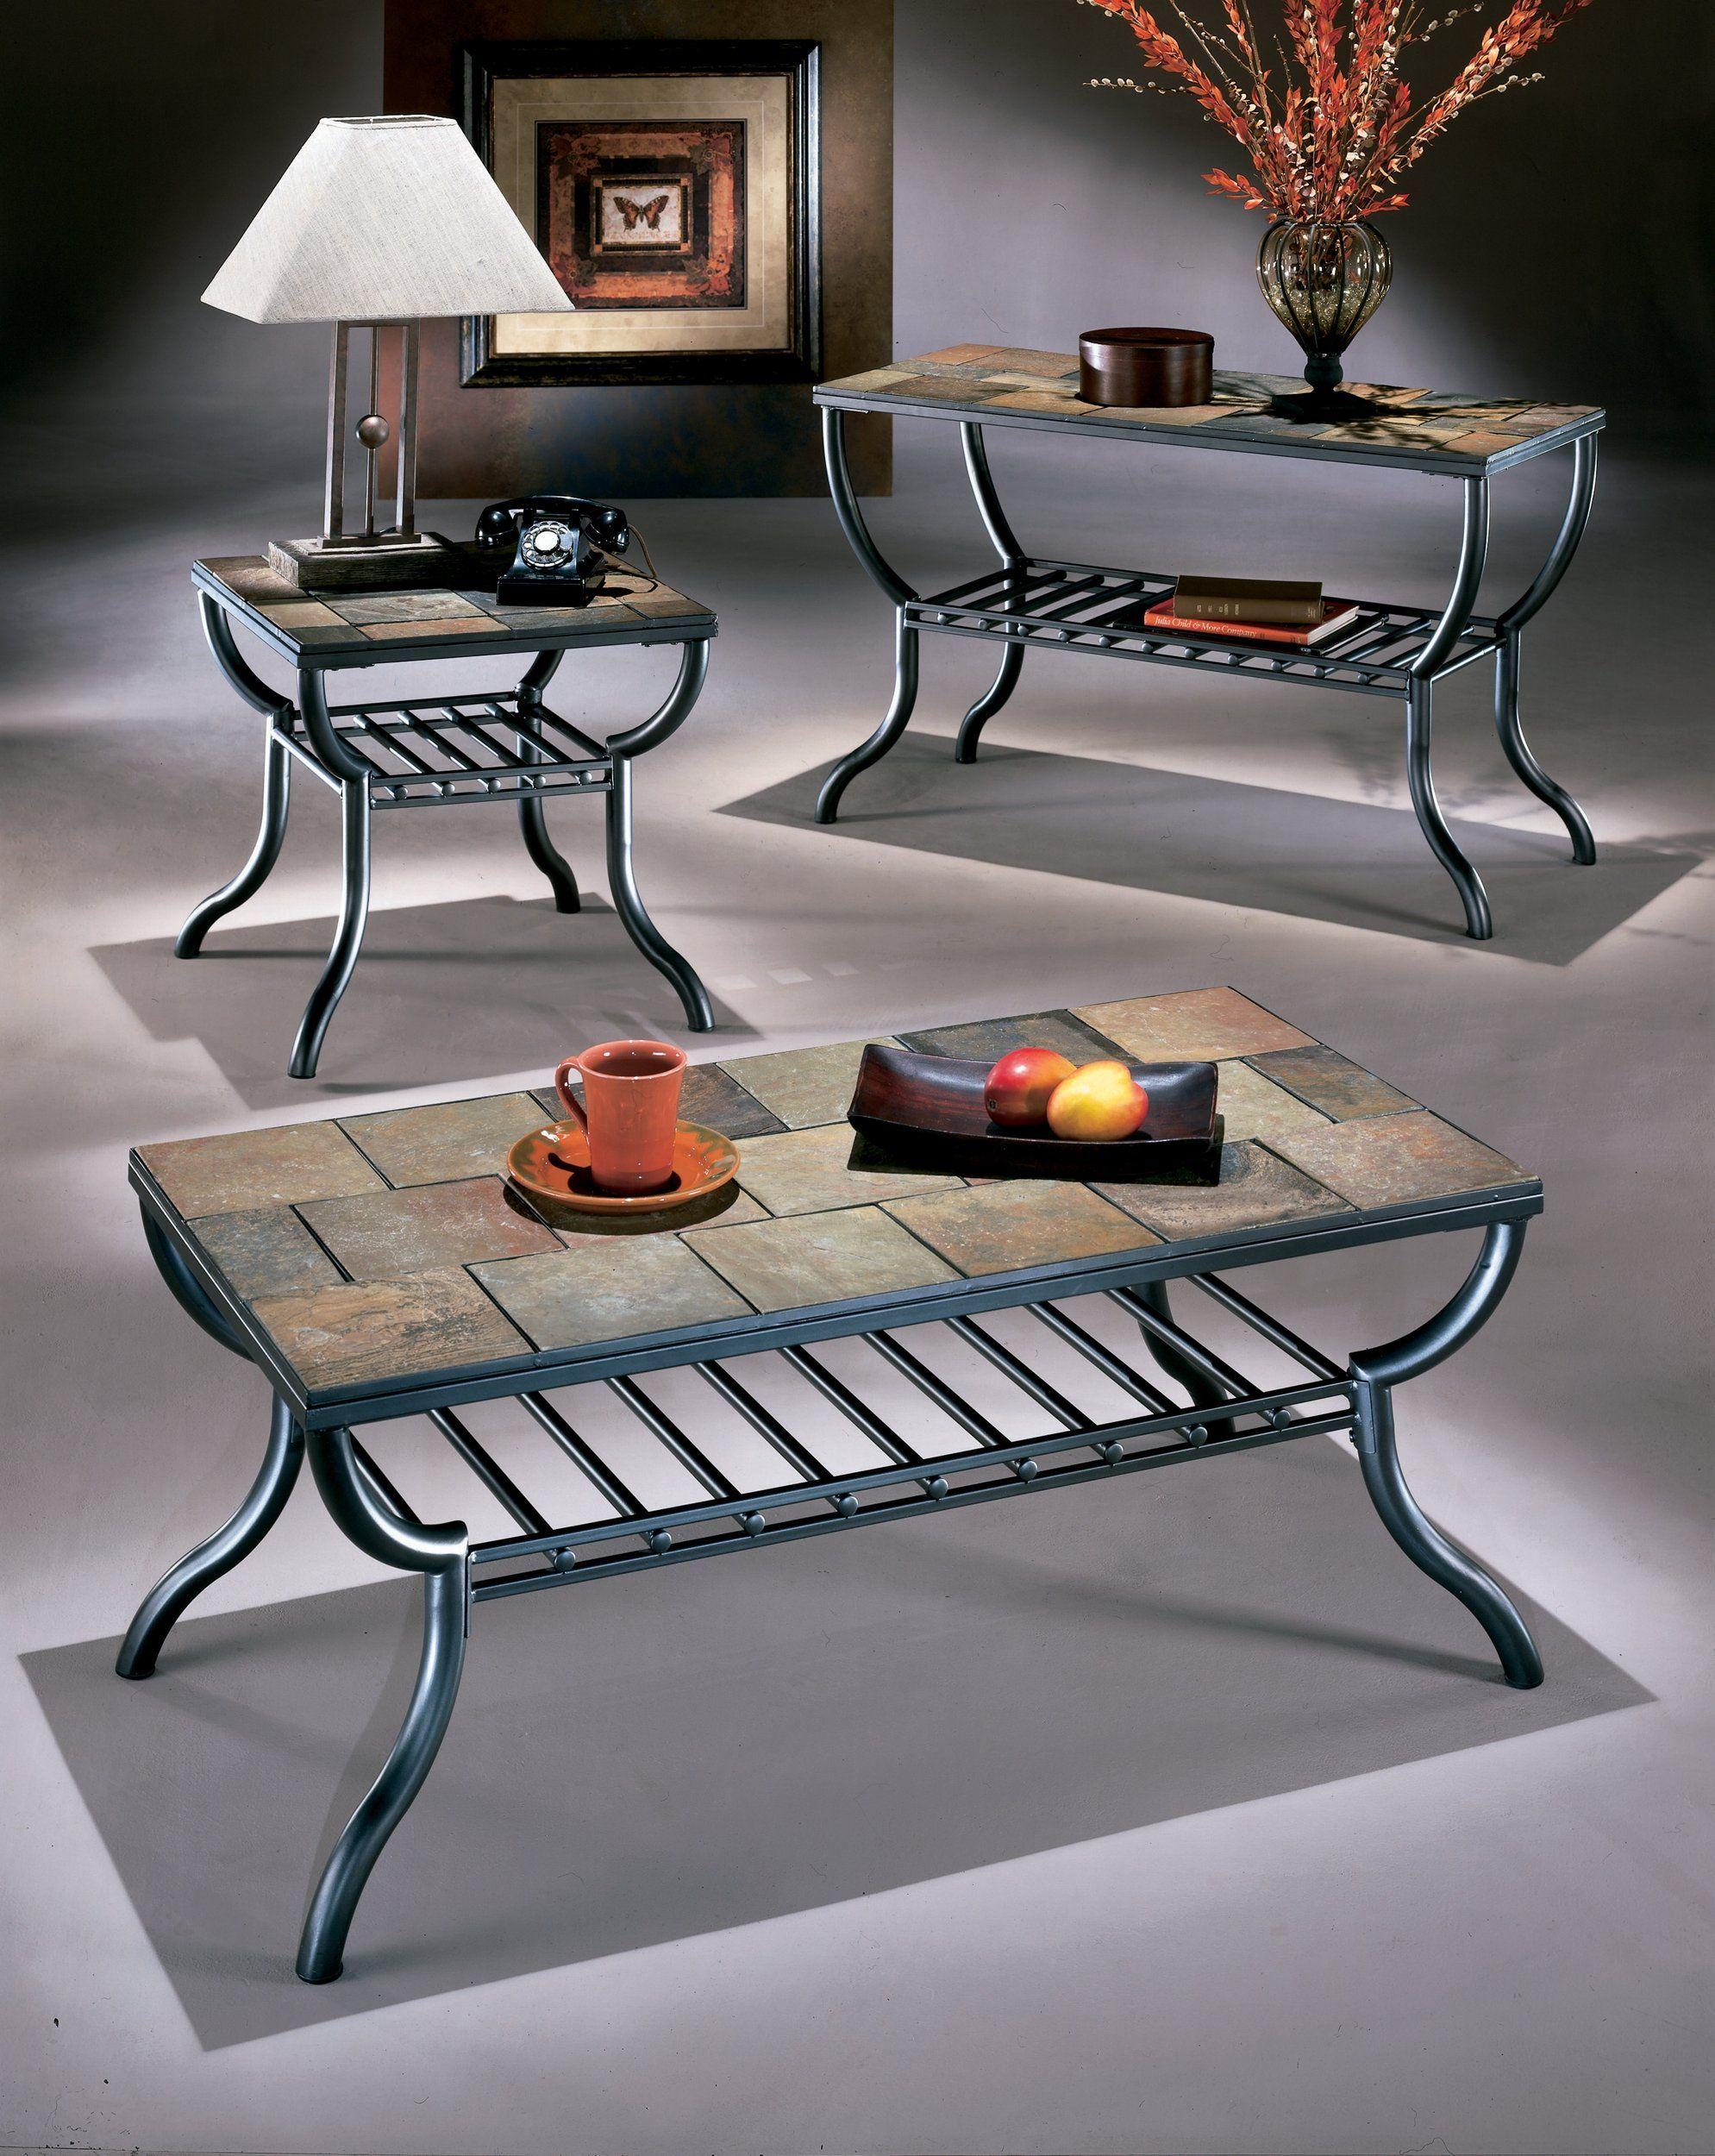 Ashley Furniture Signature Design Antigo Sofa Table With Console Slated Top With Metal Bottom Contemporary Black Coffee Table Ashley Furniture Furniture [ 2500 x 1989 Pixel ]